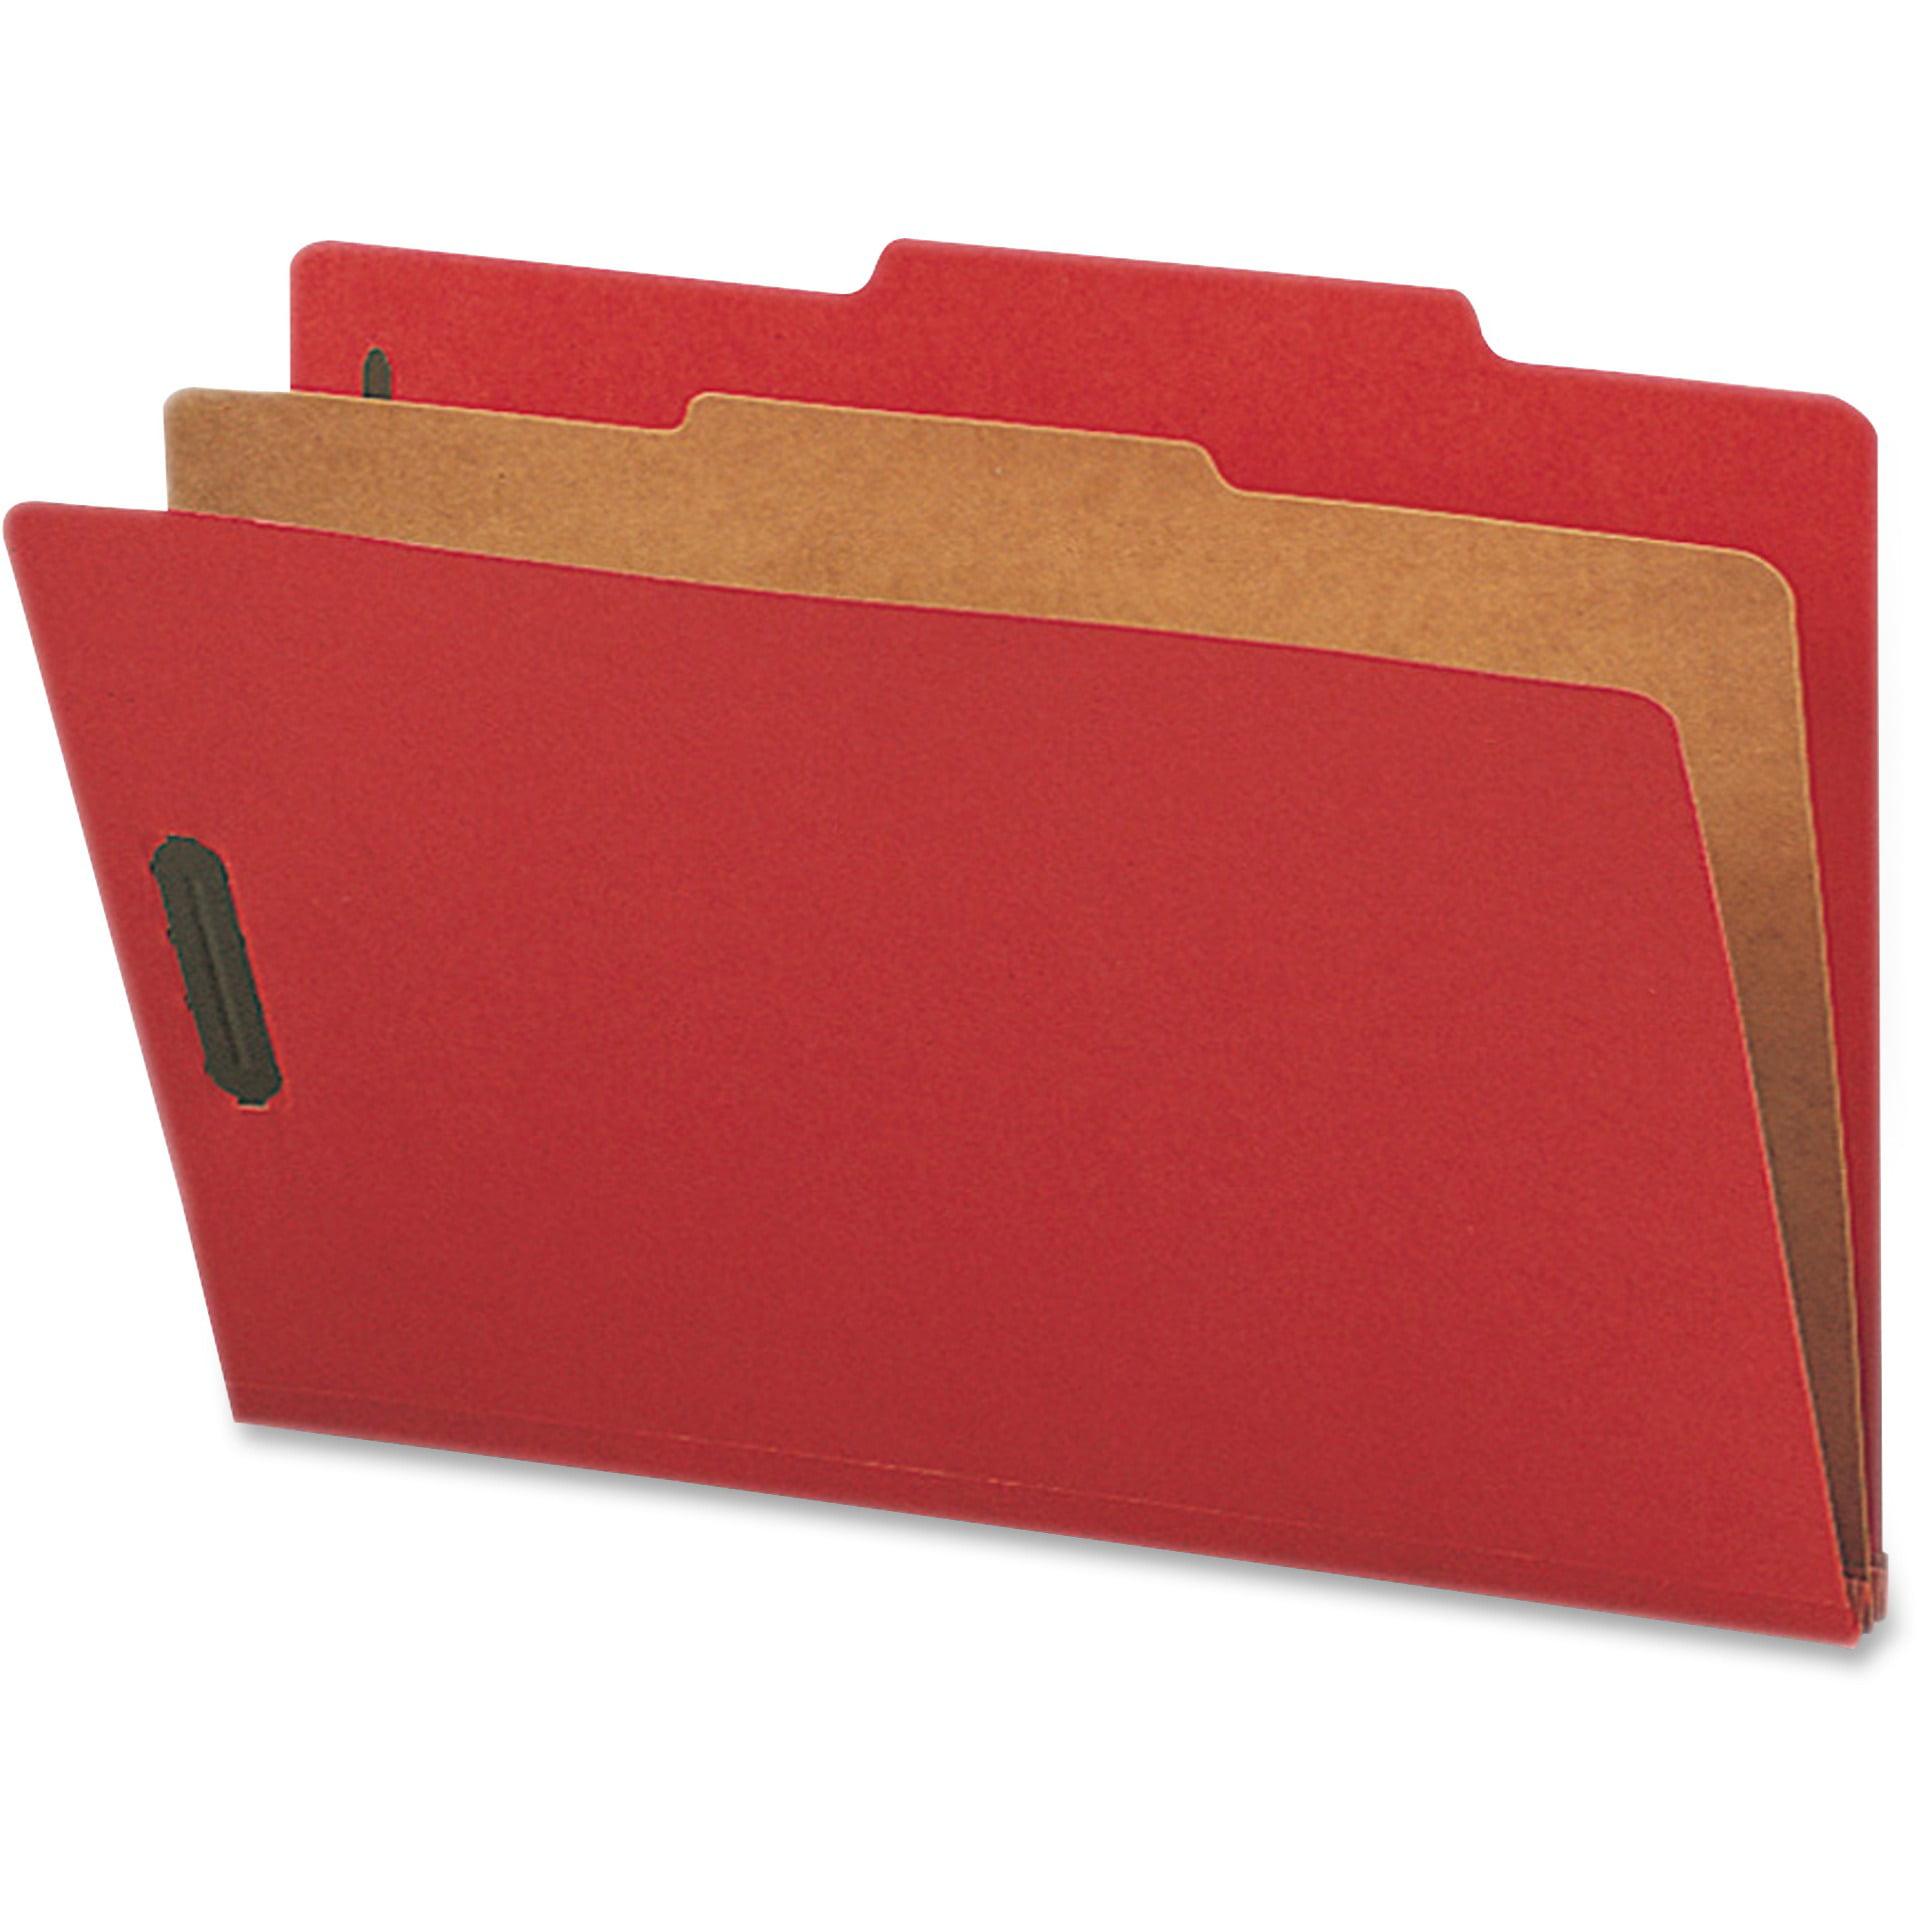 Nature Saver, NATSP17220, 1-Divider Color Classification Folders, 10 / Box, Bright Red